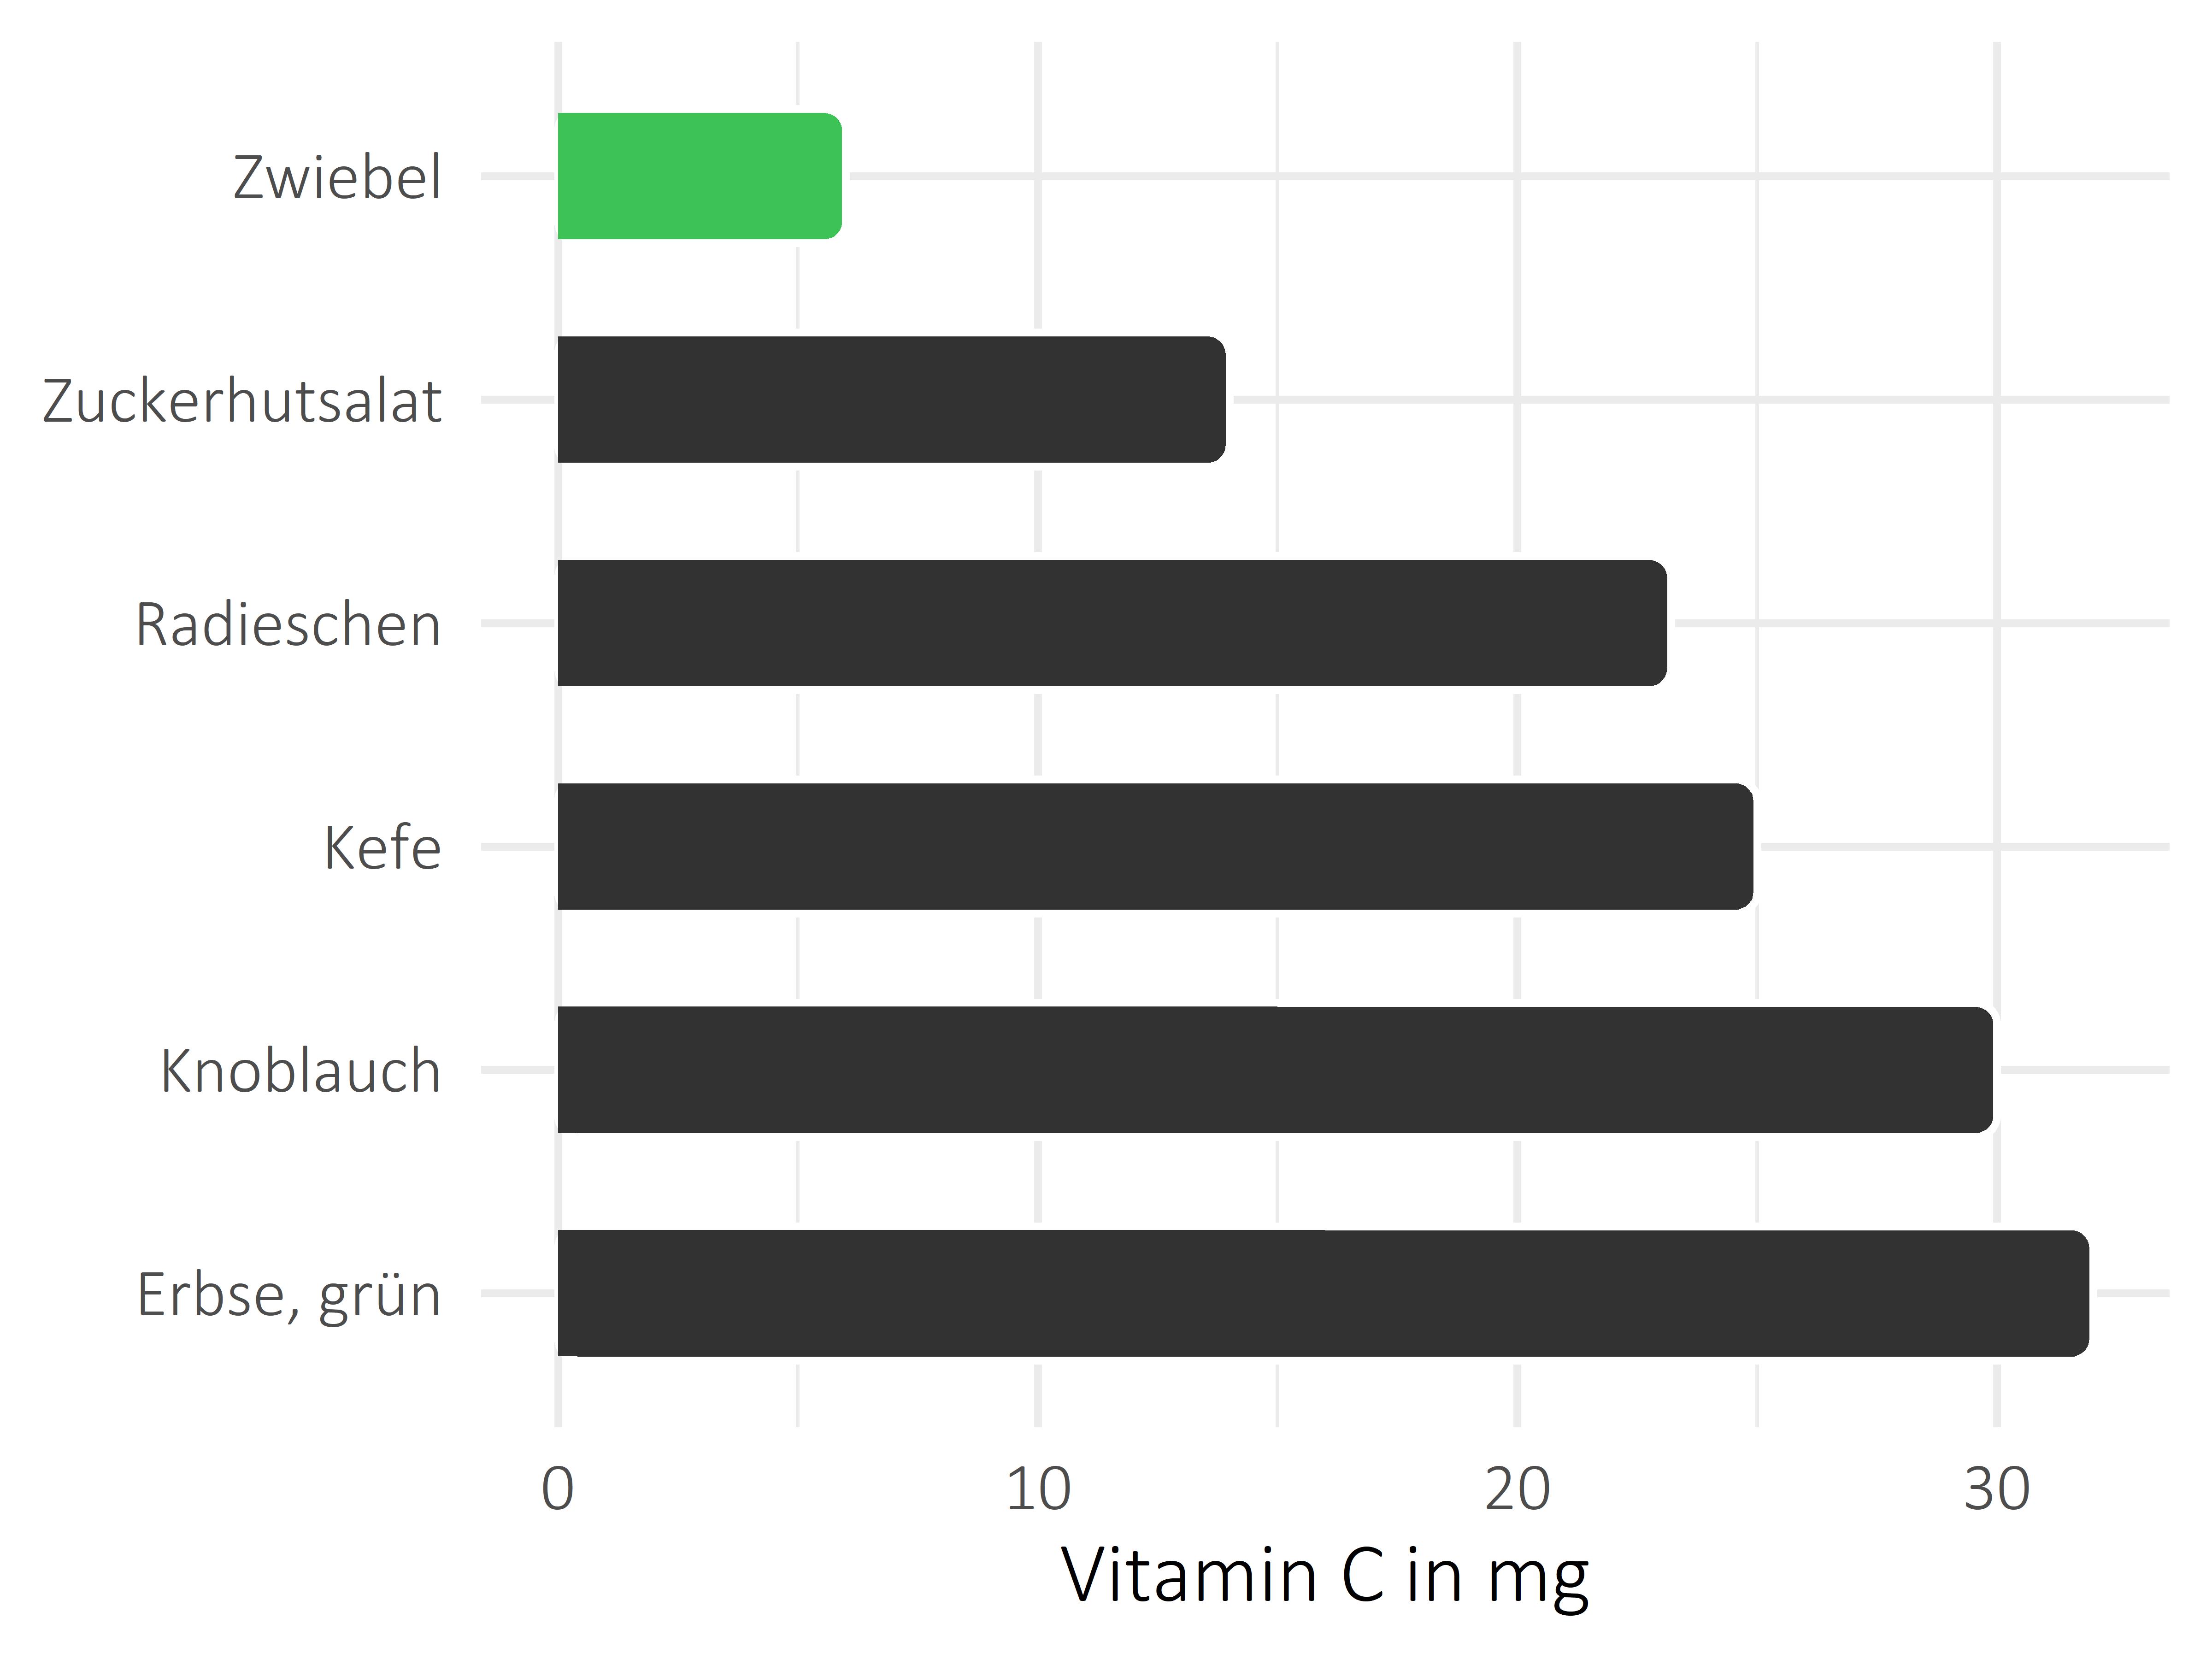 Gemüsesorten Vitamin C